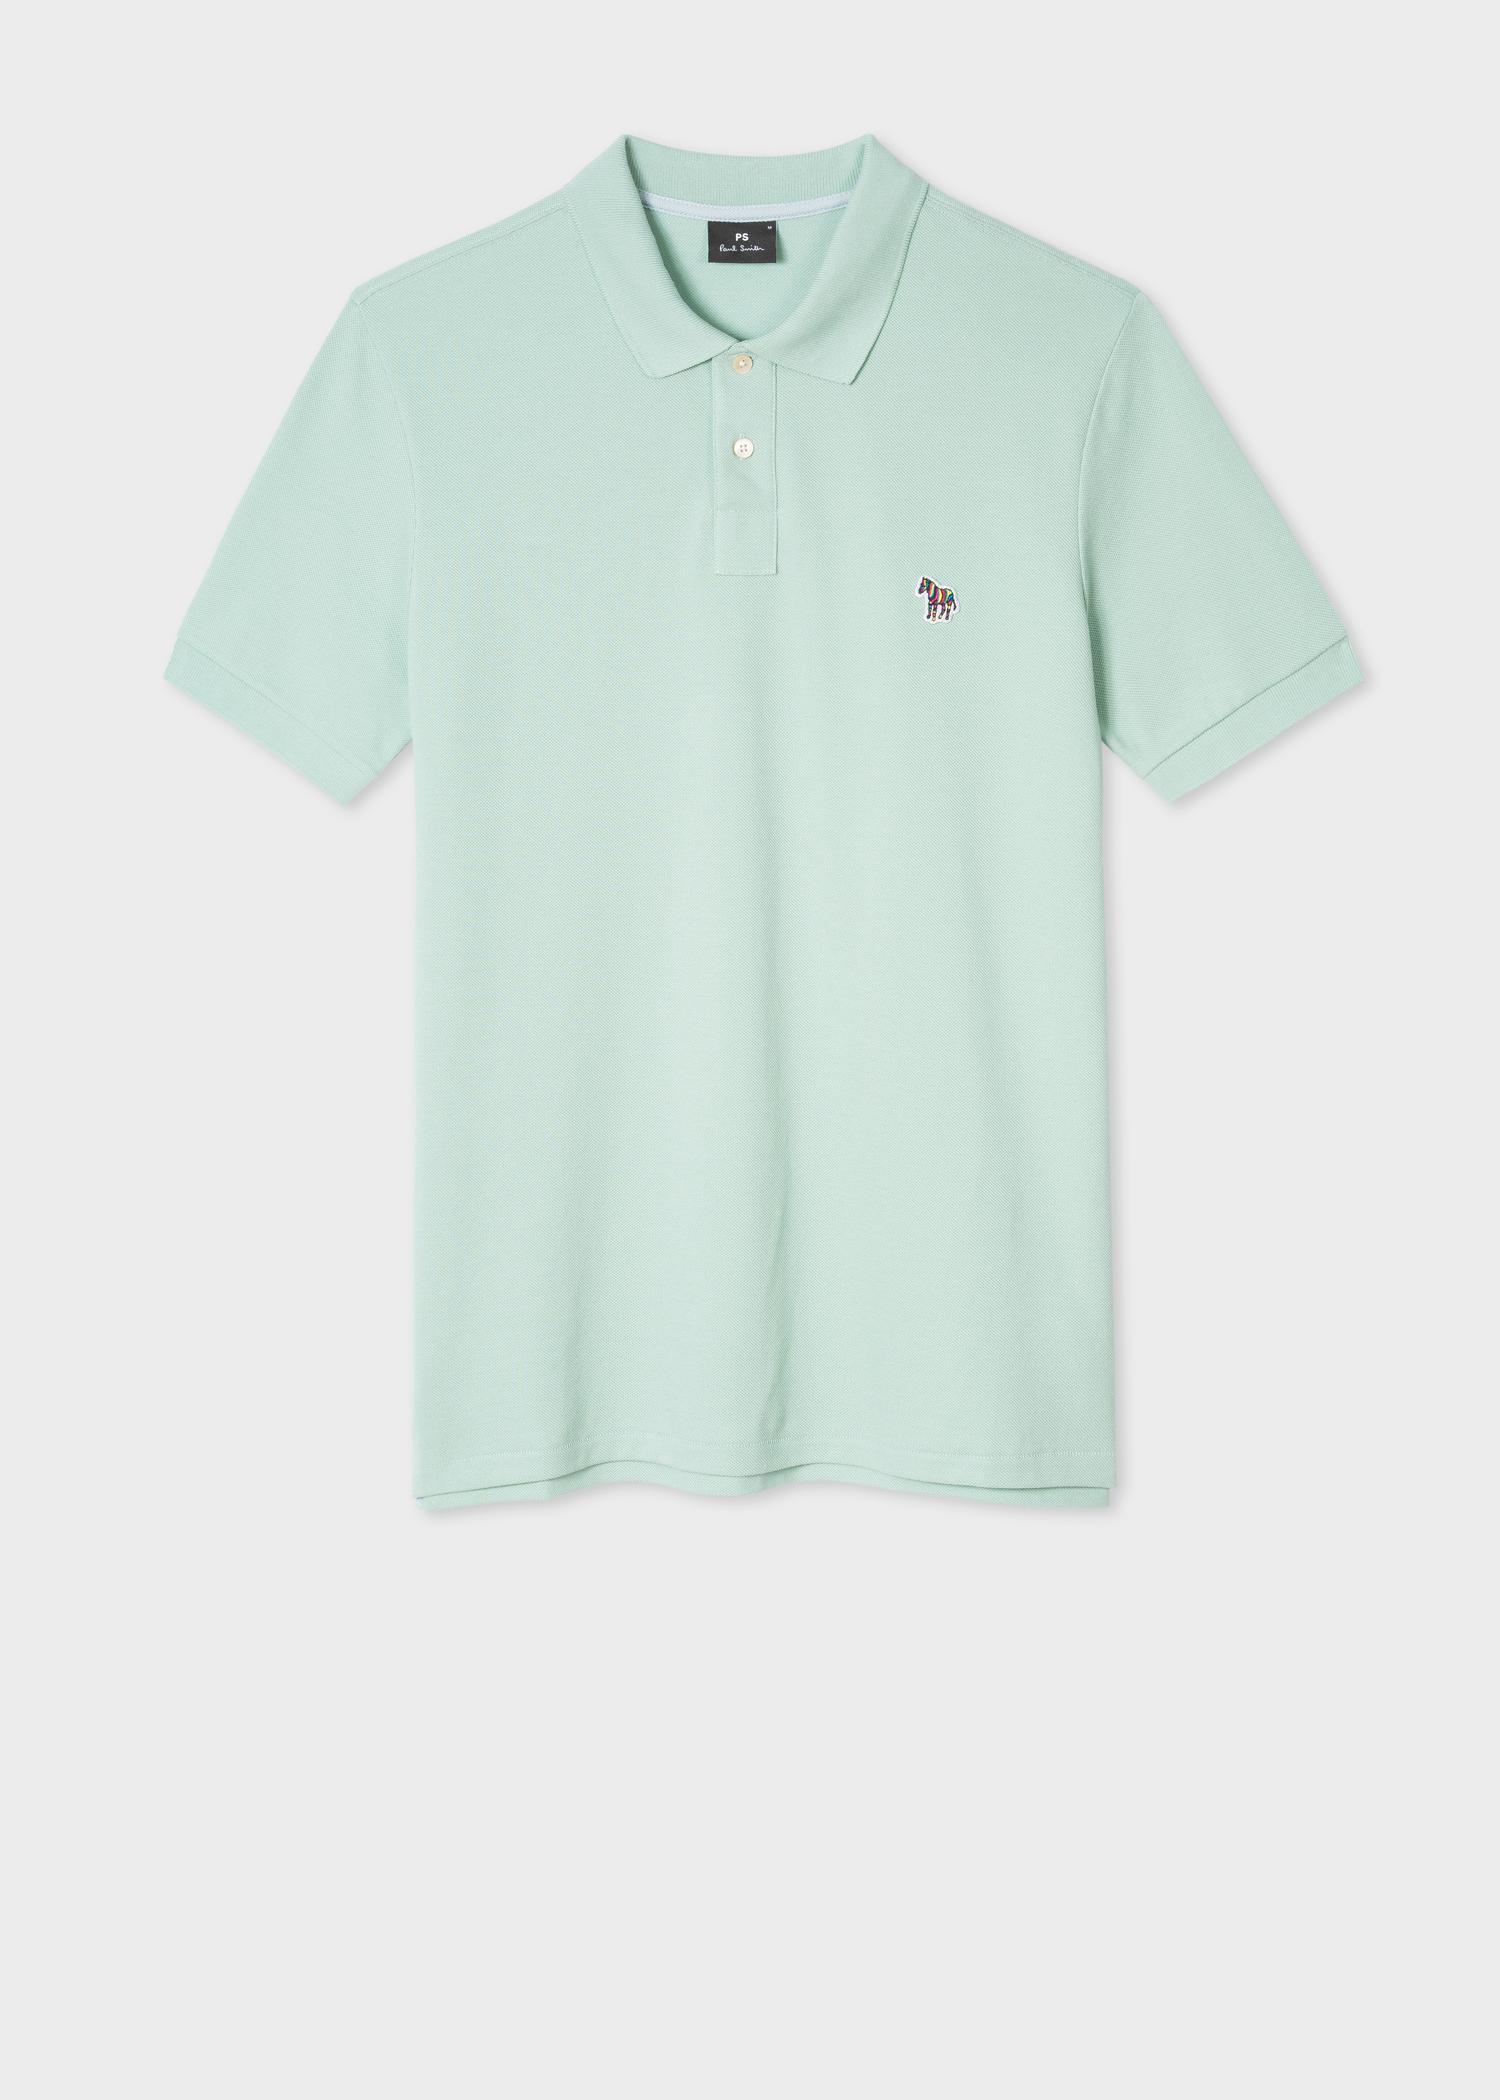 10b6a7b8b8 Paul Smith Mint Organic Cotton-Piqué Zebra Logo Polo Shirt in Green ...